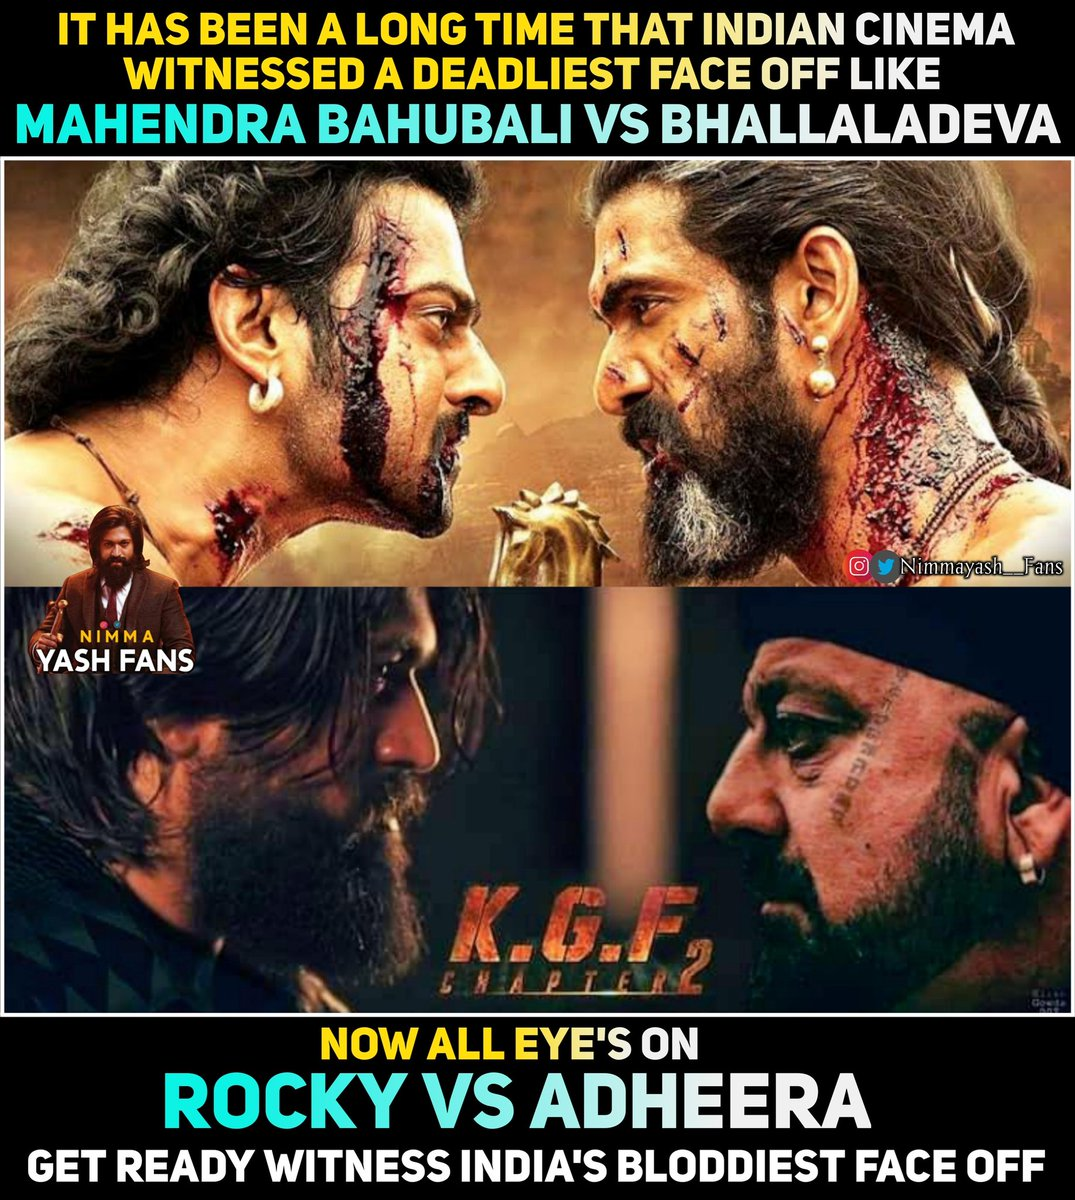 Rocky Vs Adheera Epic Face off 😈🔥  #Yash #YashBOSS #Adheera #KGF #KGF2 #KGFChapter2 #Rocky #rockybhai #thenameisyash #deadliest #Bahubali https://t.co/pLtQL3Vy72